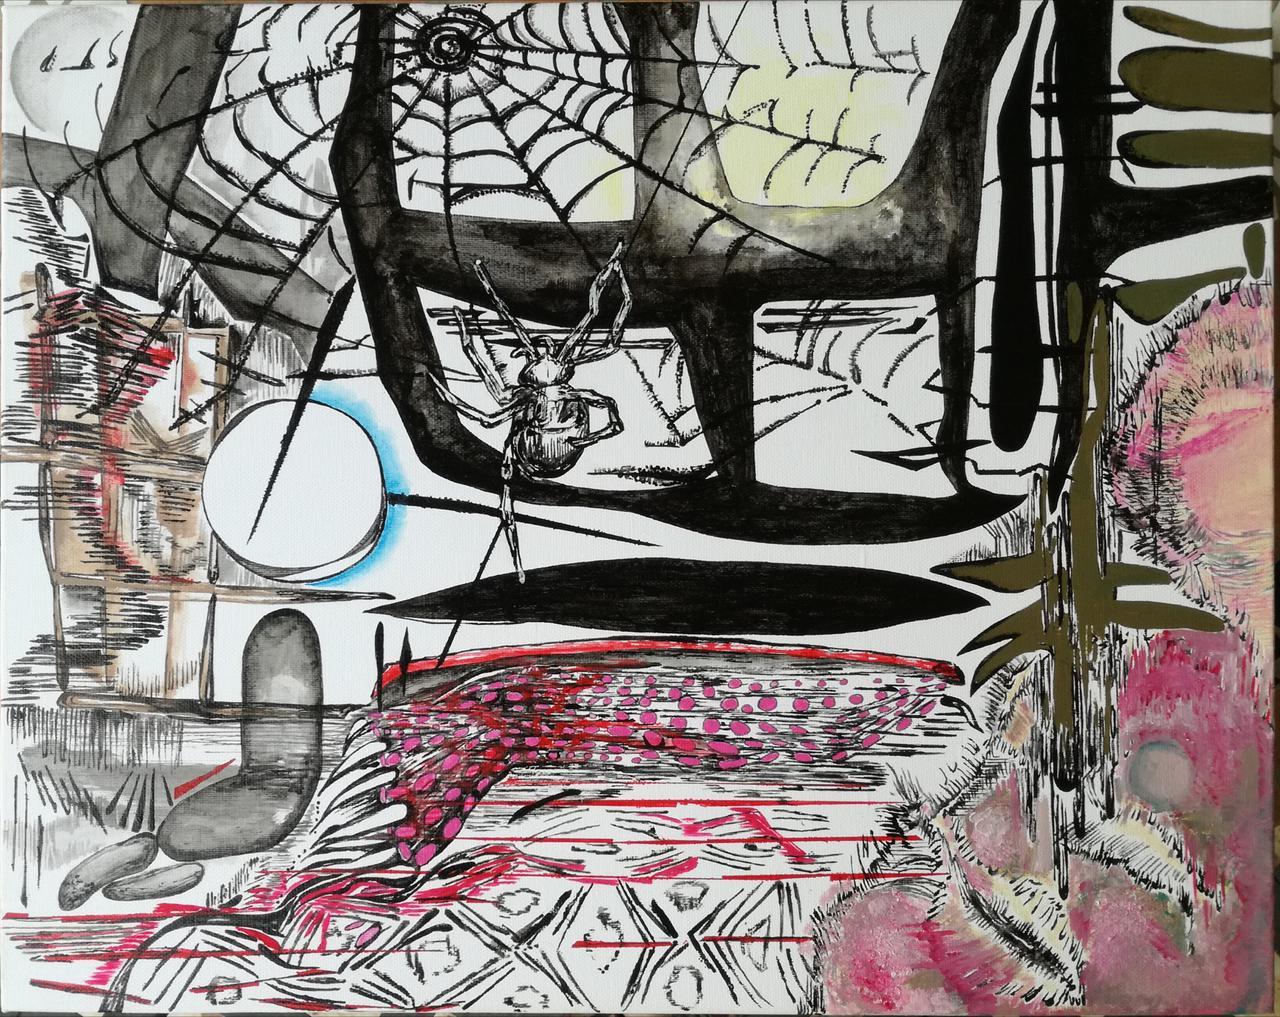 Vana Fertaki, Spider, 40 x 50 cm, varnish and oil on canvas